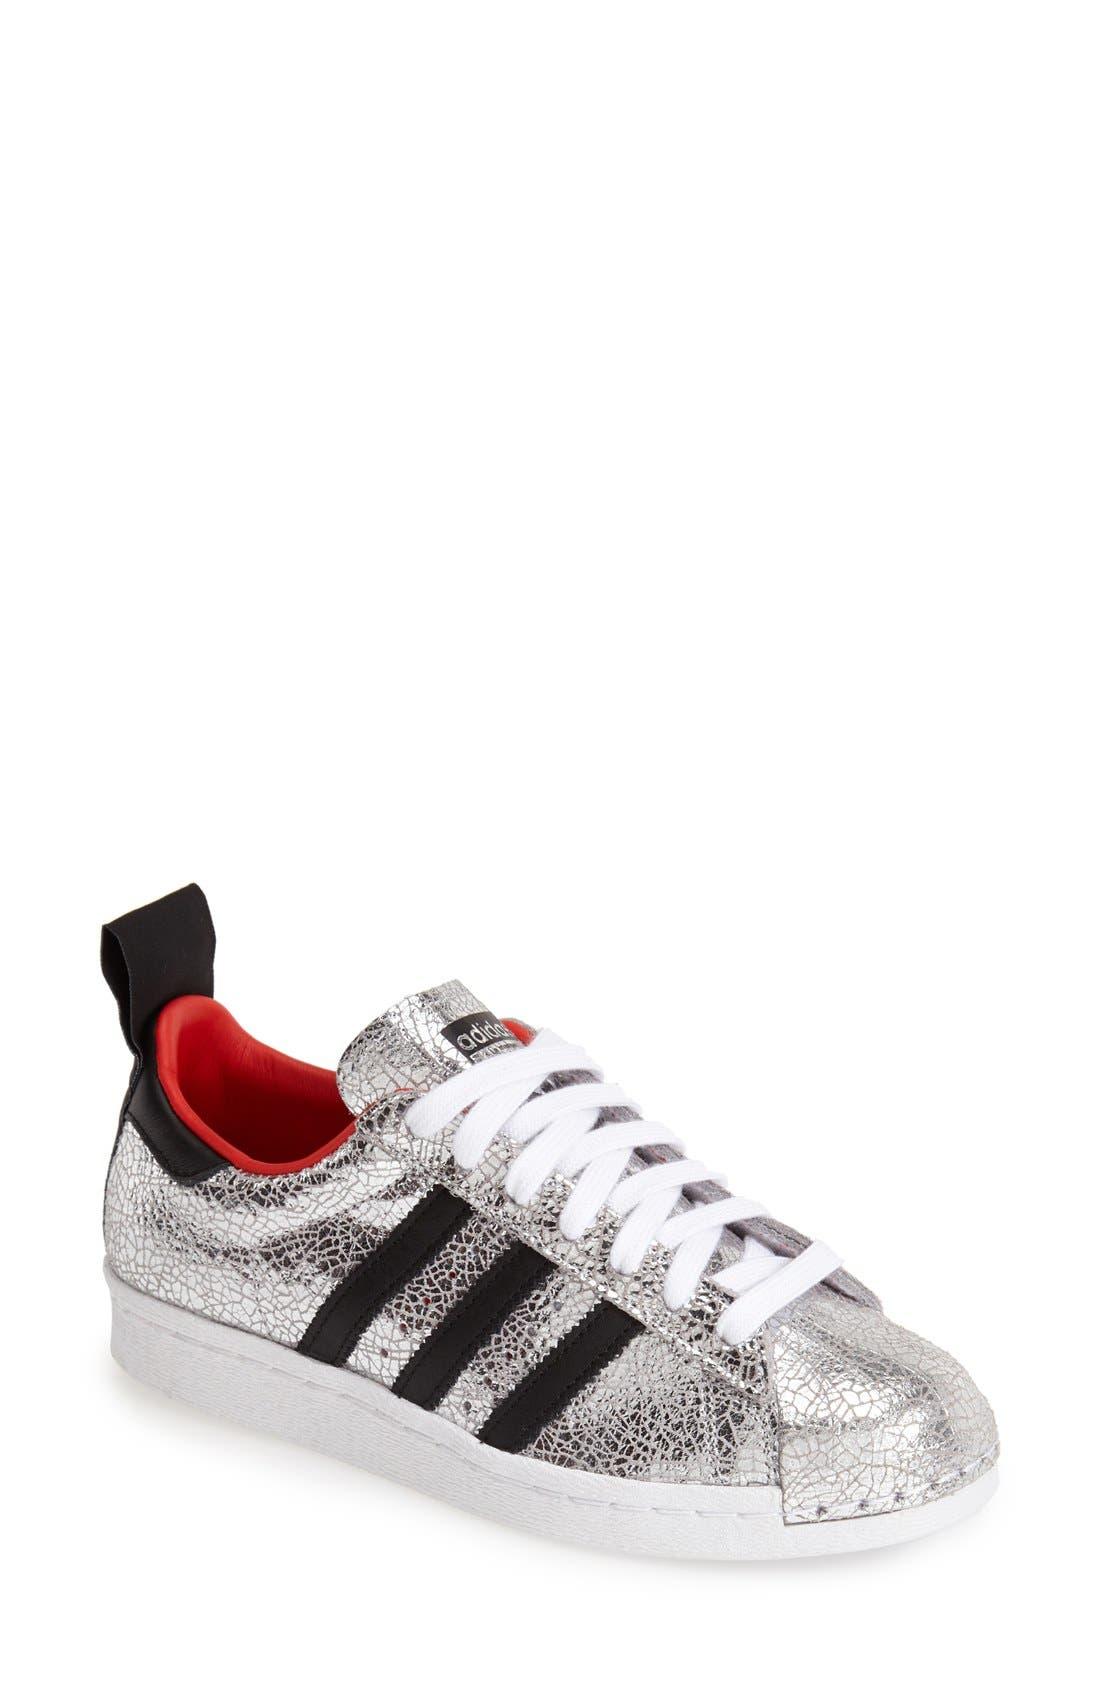 Main Image - Topshop for adidas Originals '80s Premium Superstar' Sneaker (Women)